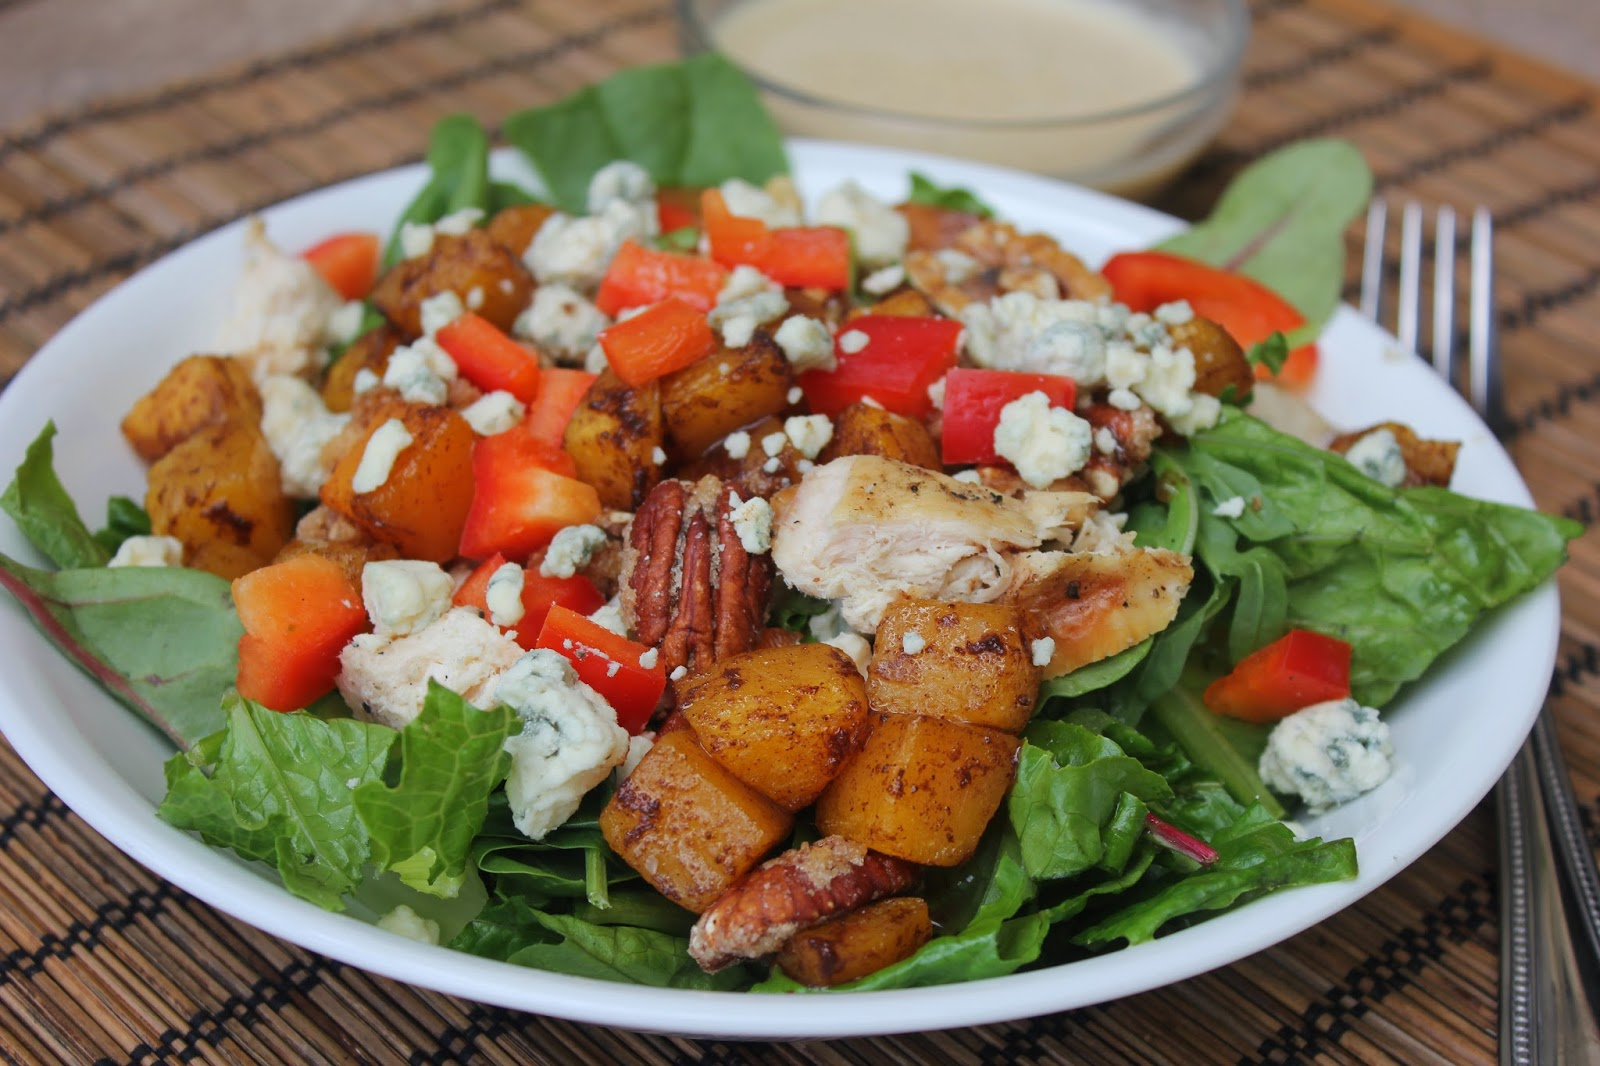 Toscana Italian Bistro Butternut Squash Salad with Maple Sage Cream Dressing, Recipe:  Salad, Recipe:  Chicken,  Copycat Recipes,